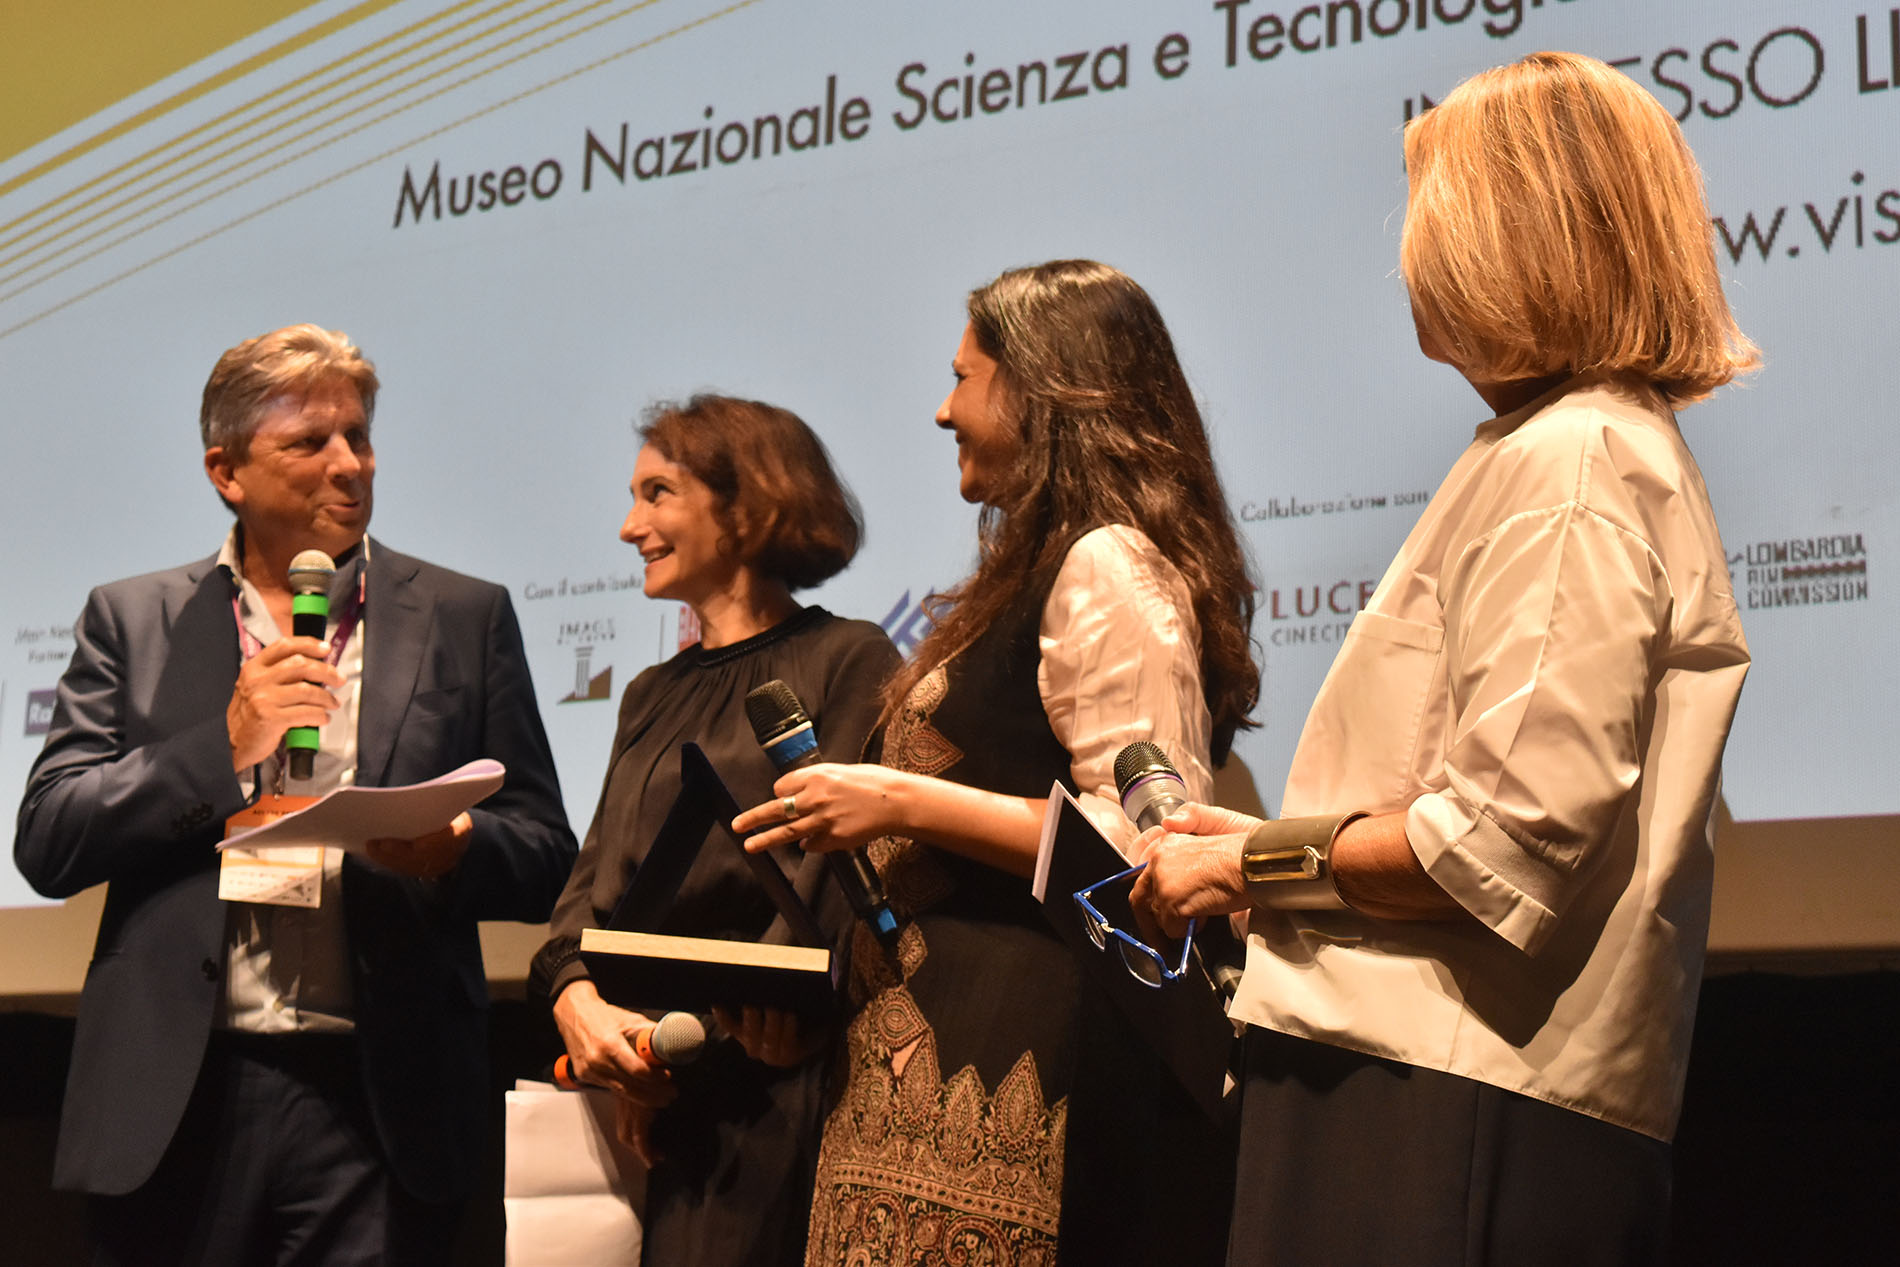 Premio BNL Gruppo BNP Paribas Visioni dal Mondo Giuria Giovani a Strange Fish di Giulia Bertoluzzi